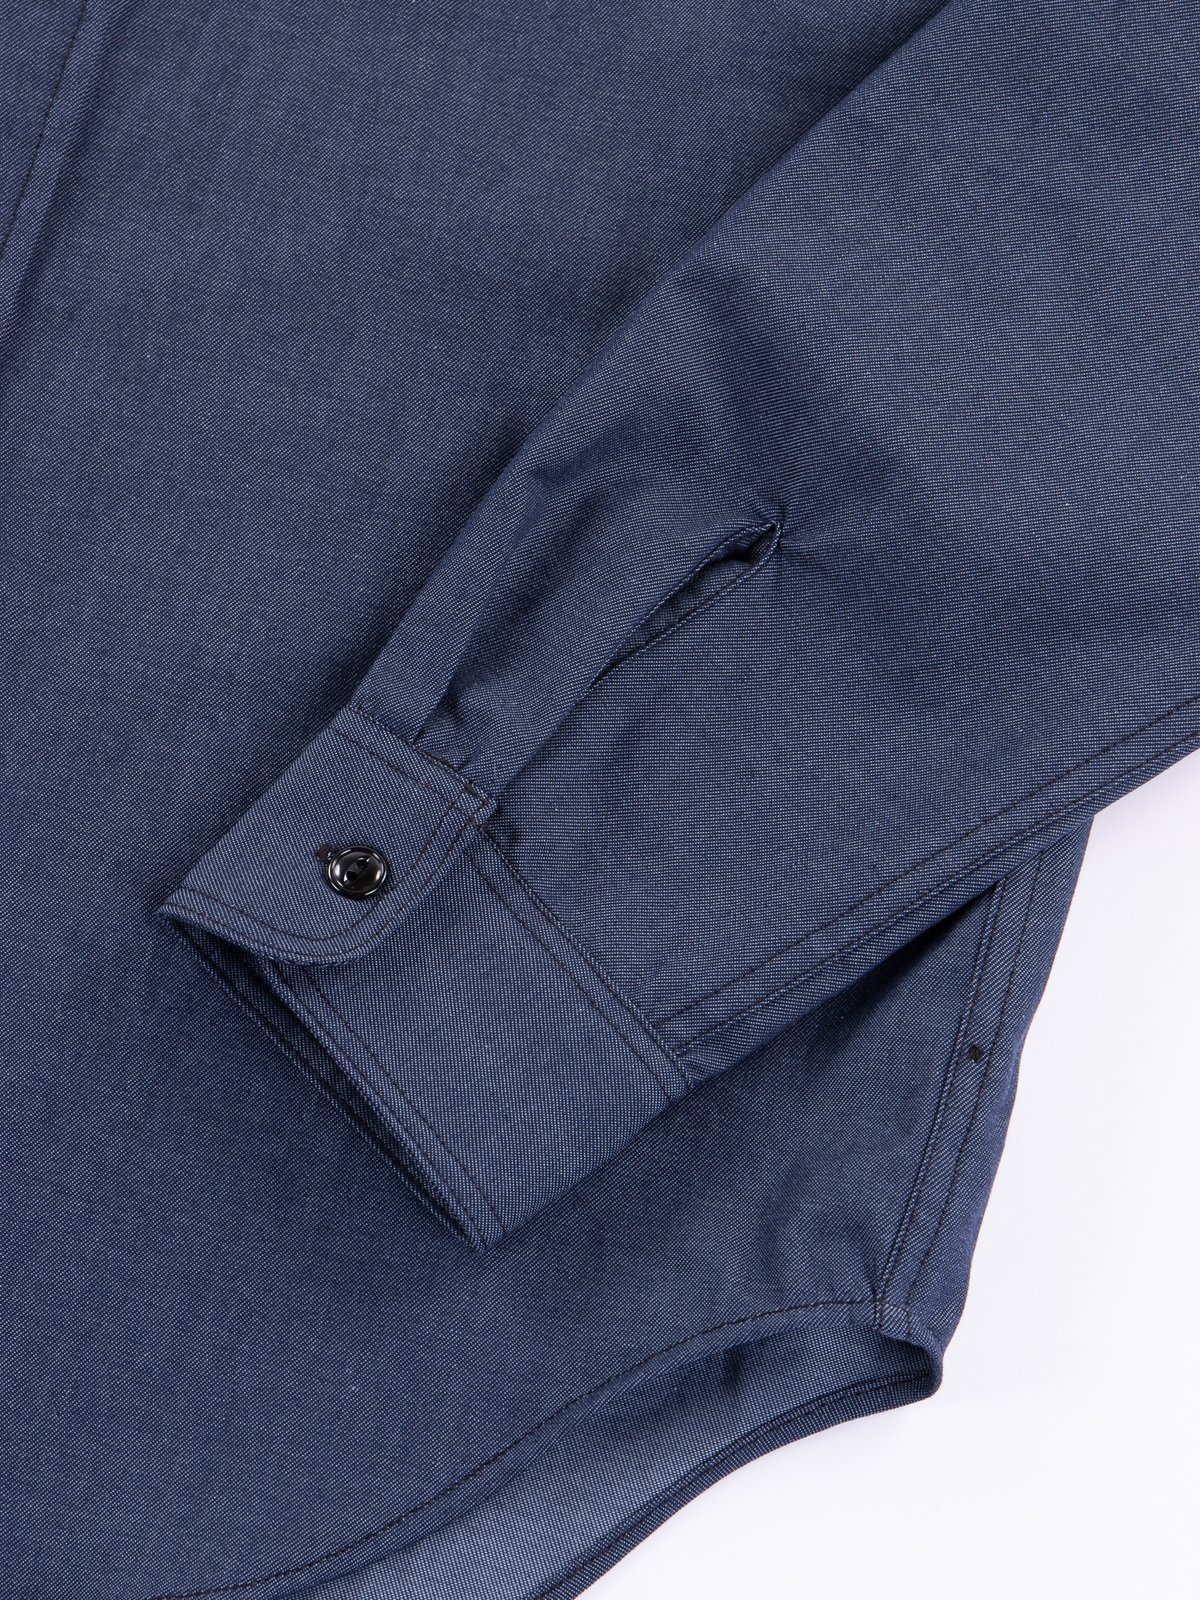 Indigo Cotton Denim Utility Shirt - Image 3